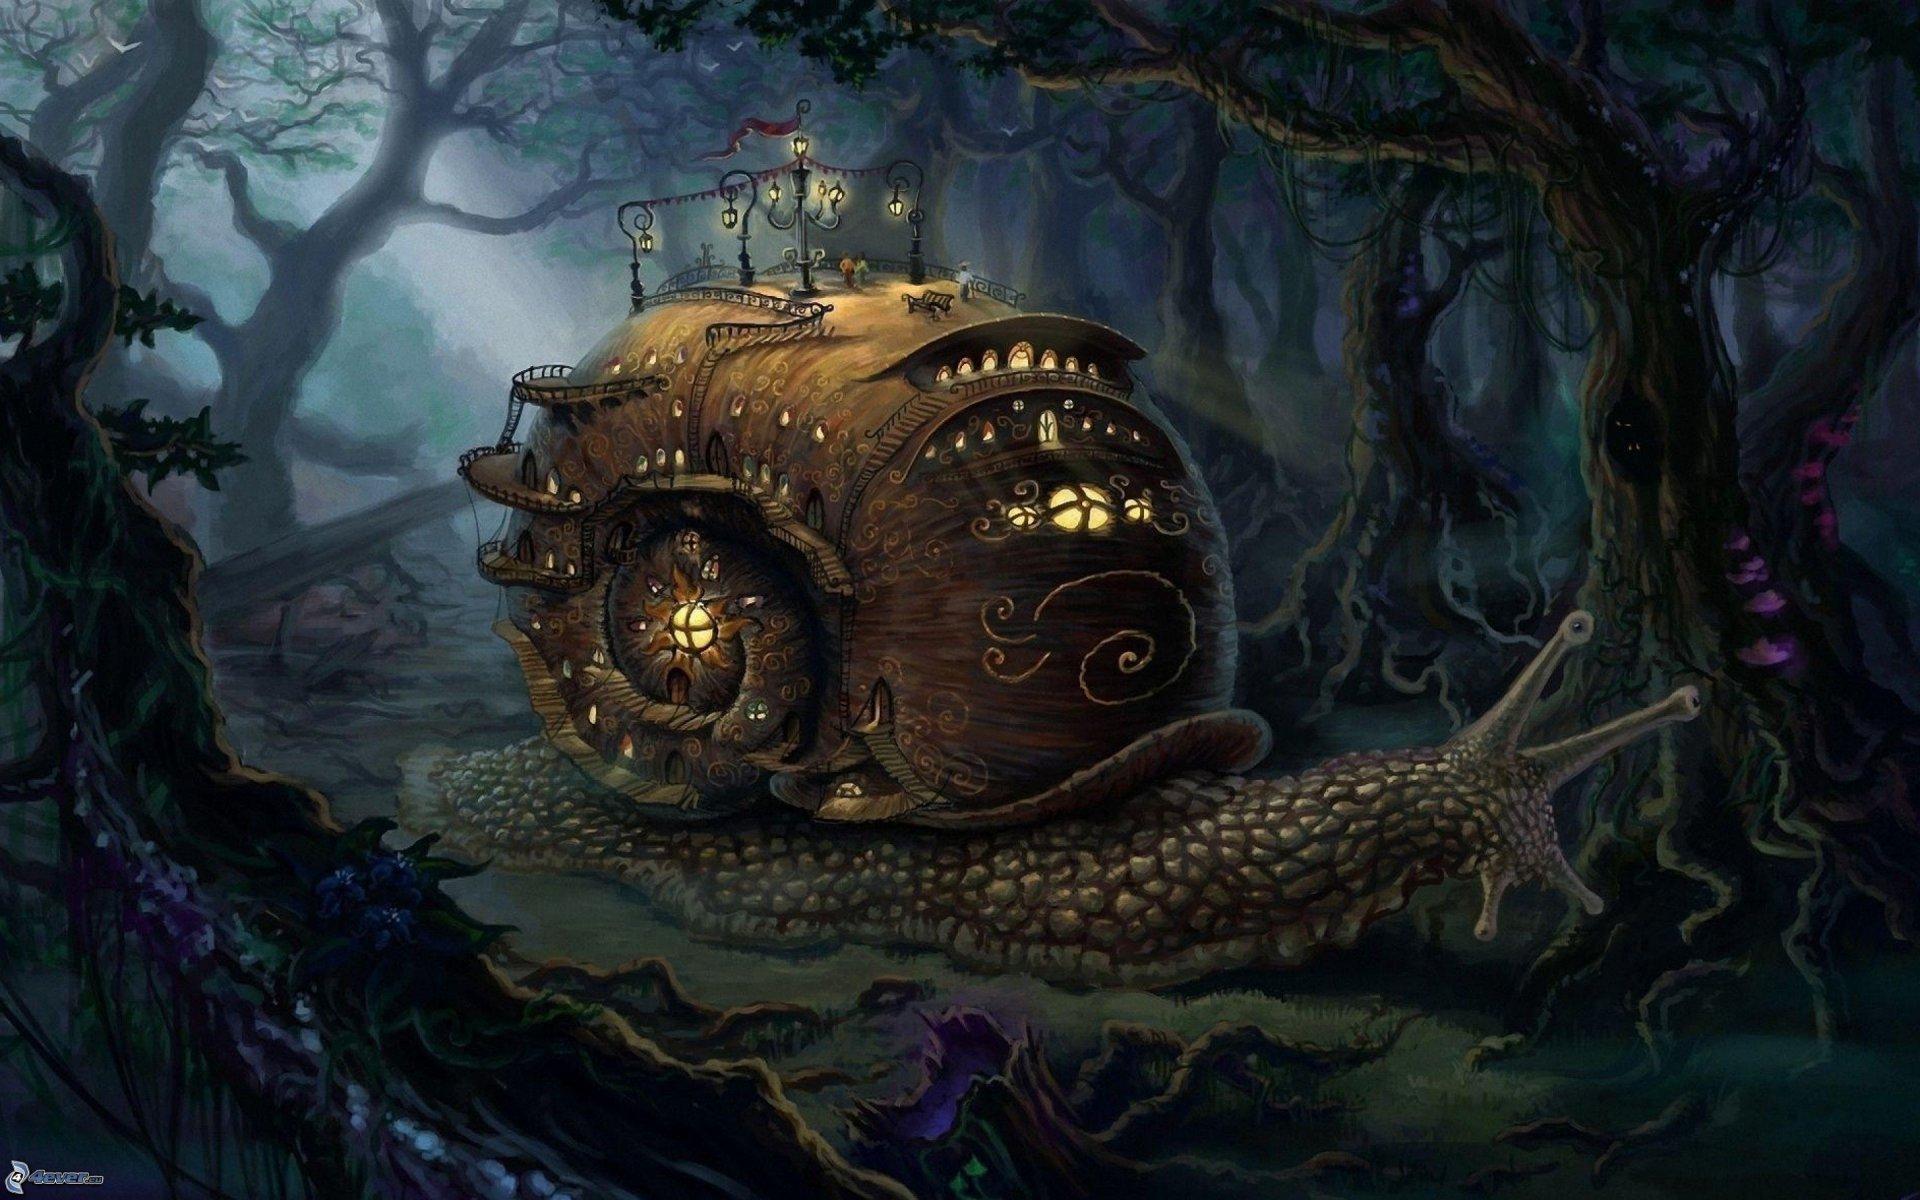 slimak,-kresleny-dom,-tmavy-les,-fantasy-175908.jpg